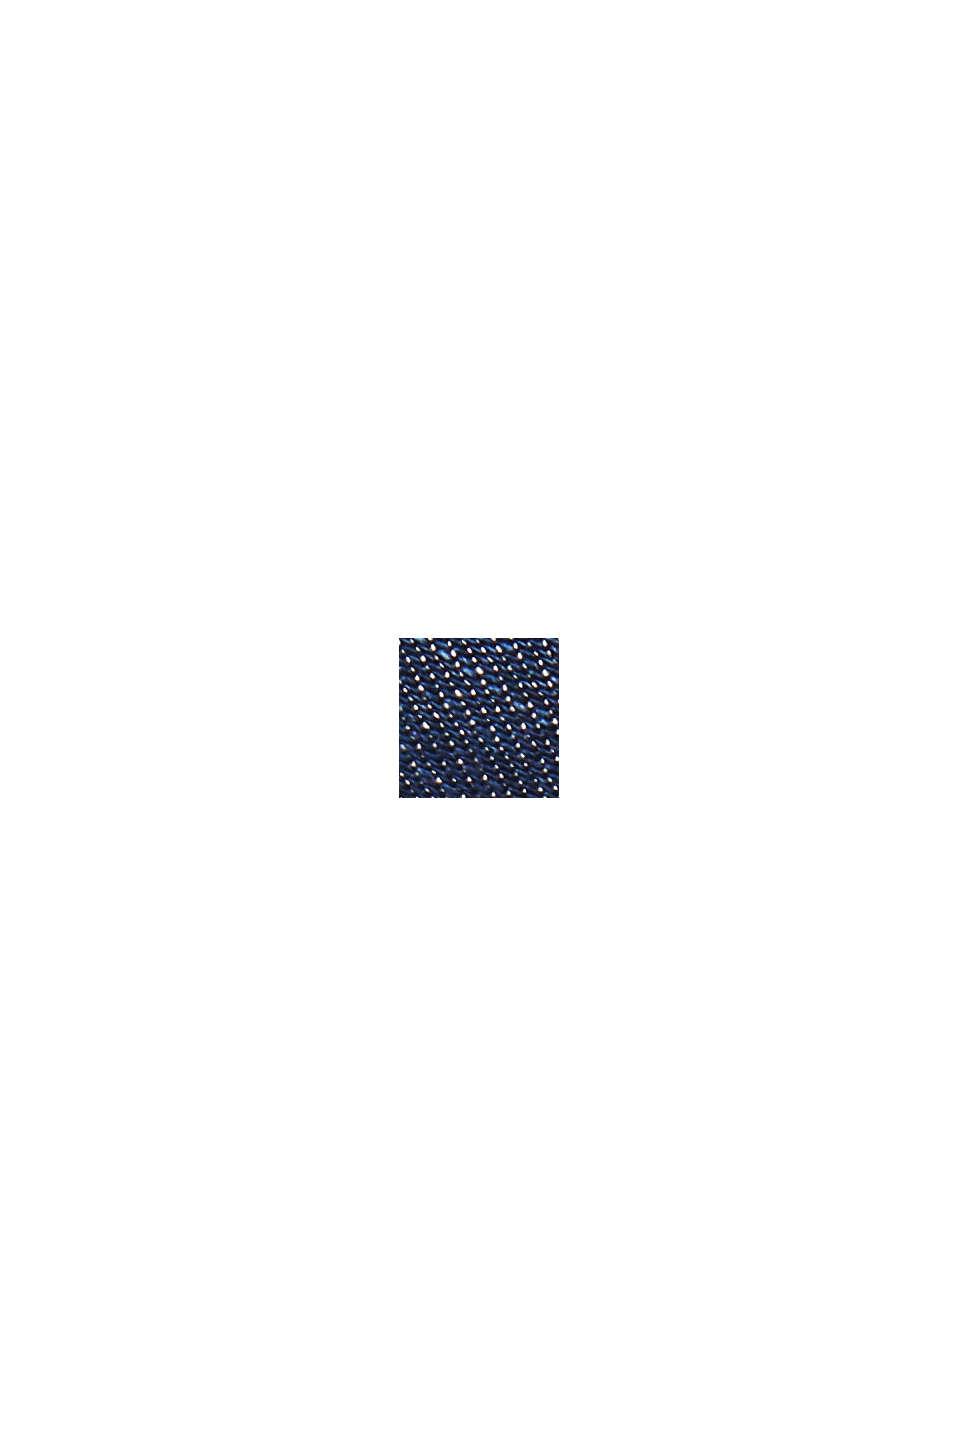 Van TENCEL™ lyocell: denim blouse, BLUE DARK WASHED, swatch